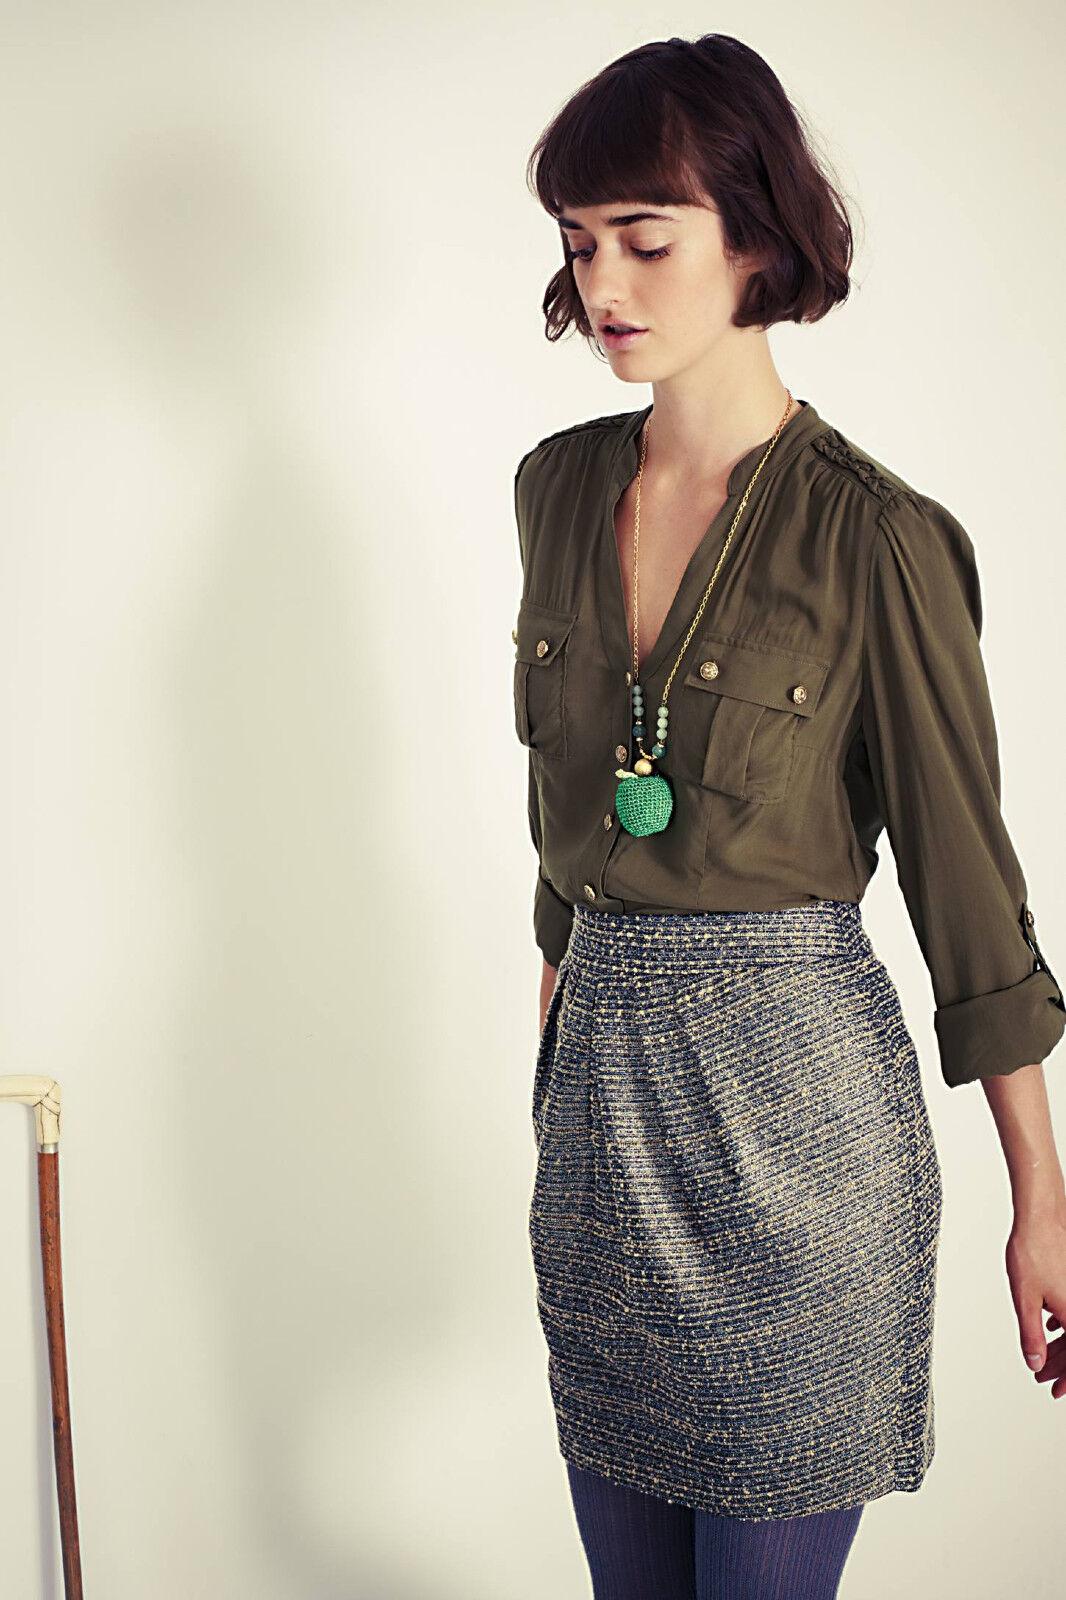 Anthropologie Skirt Avant-Tweed High Waist Pencil Pleated Metallic Tabitha 10 12